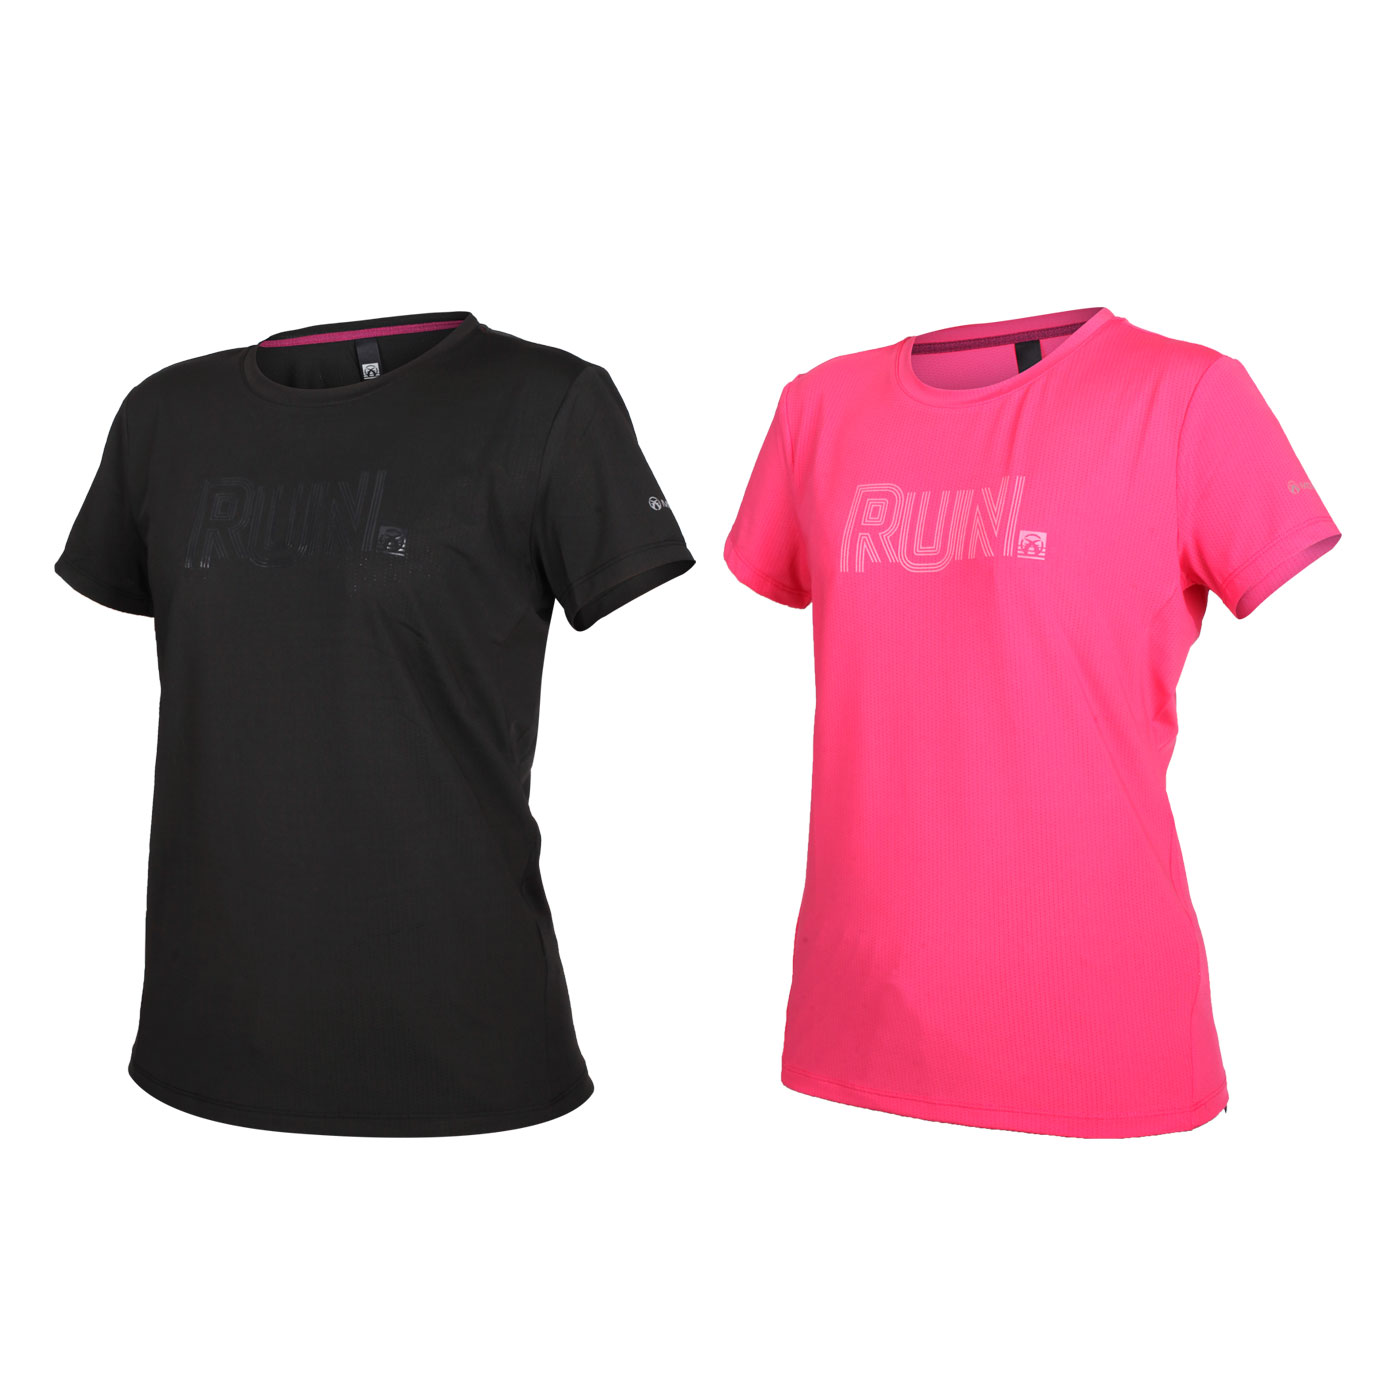 FIRESTAR 女款彈性印花圓領短袖T恤 DL062-10